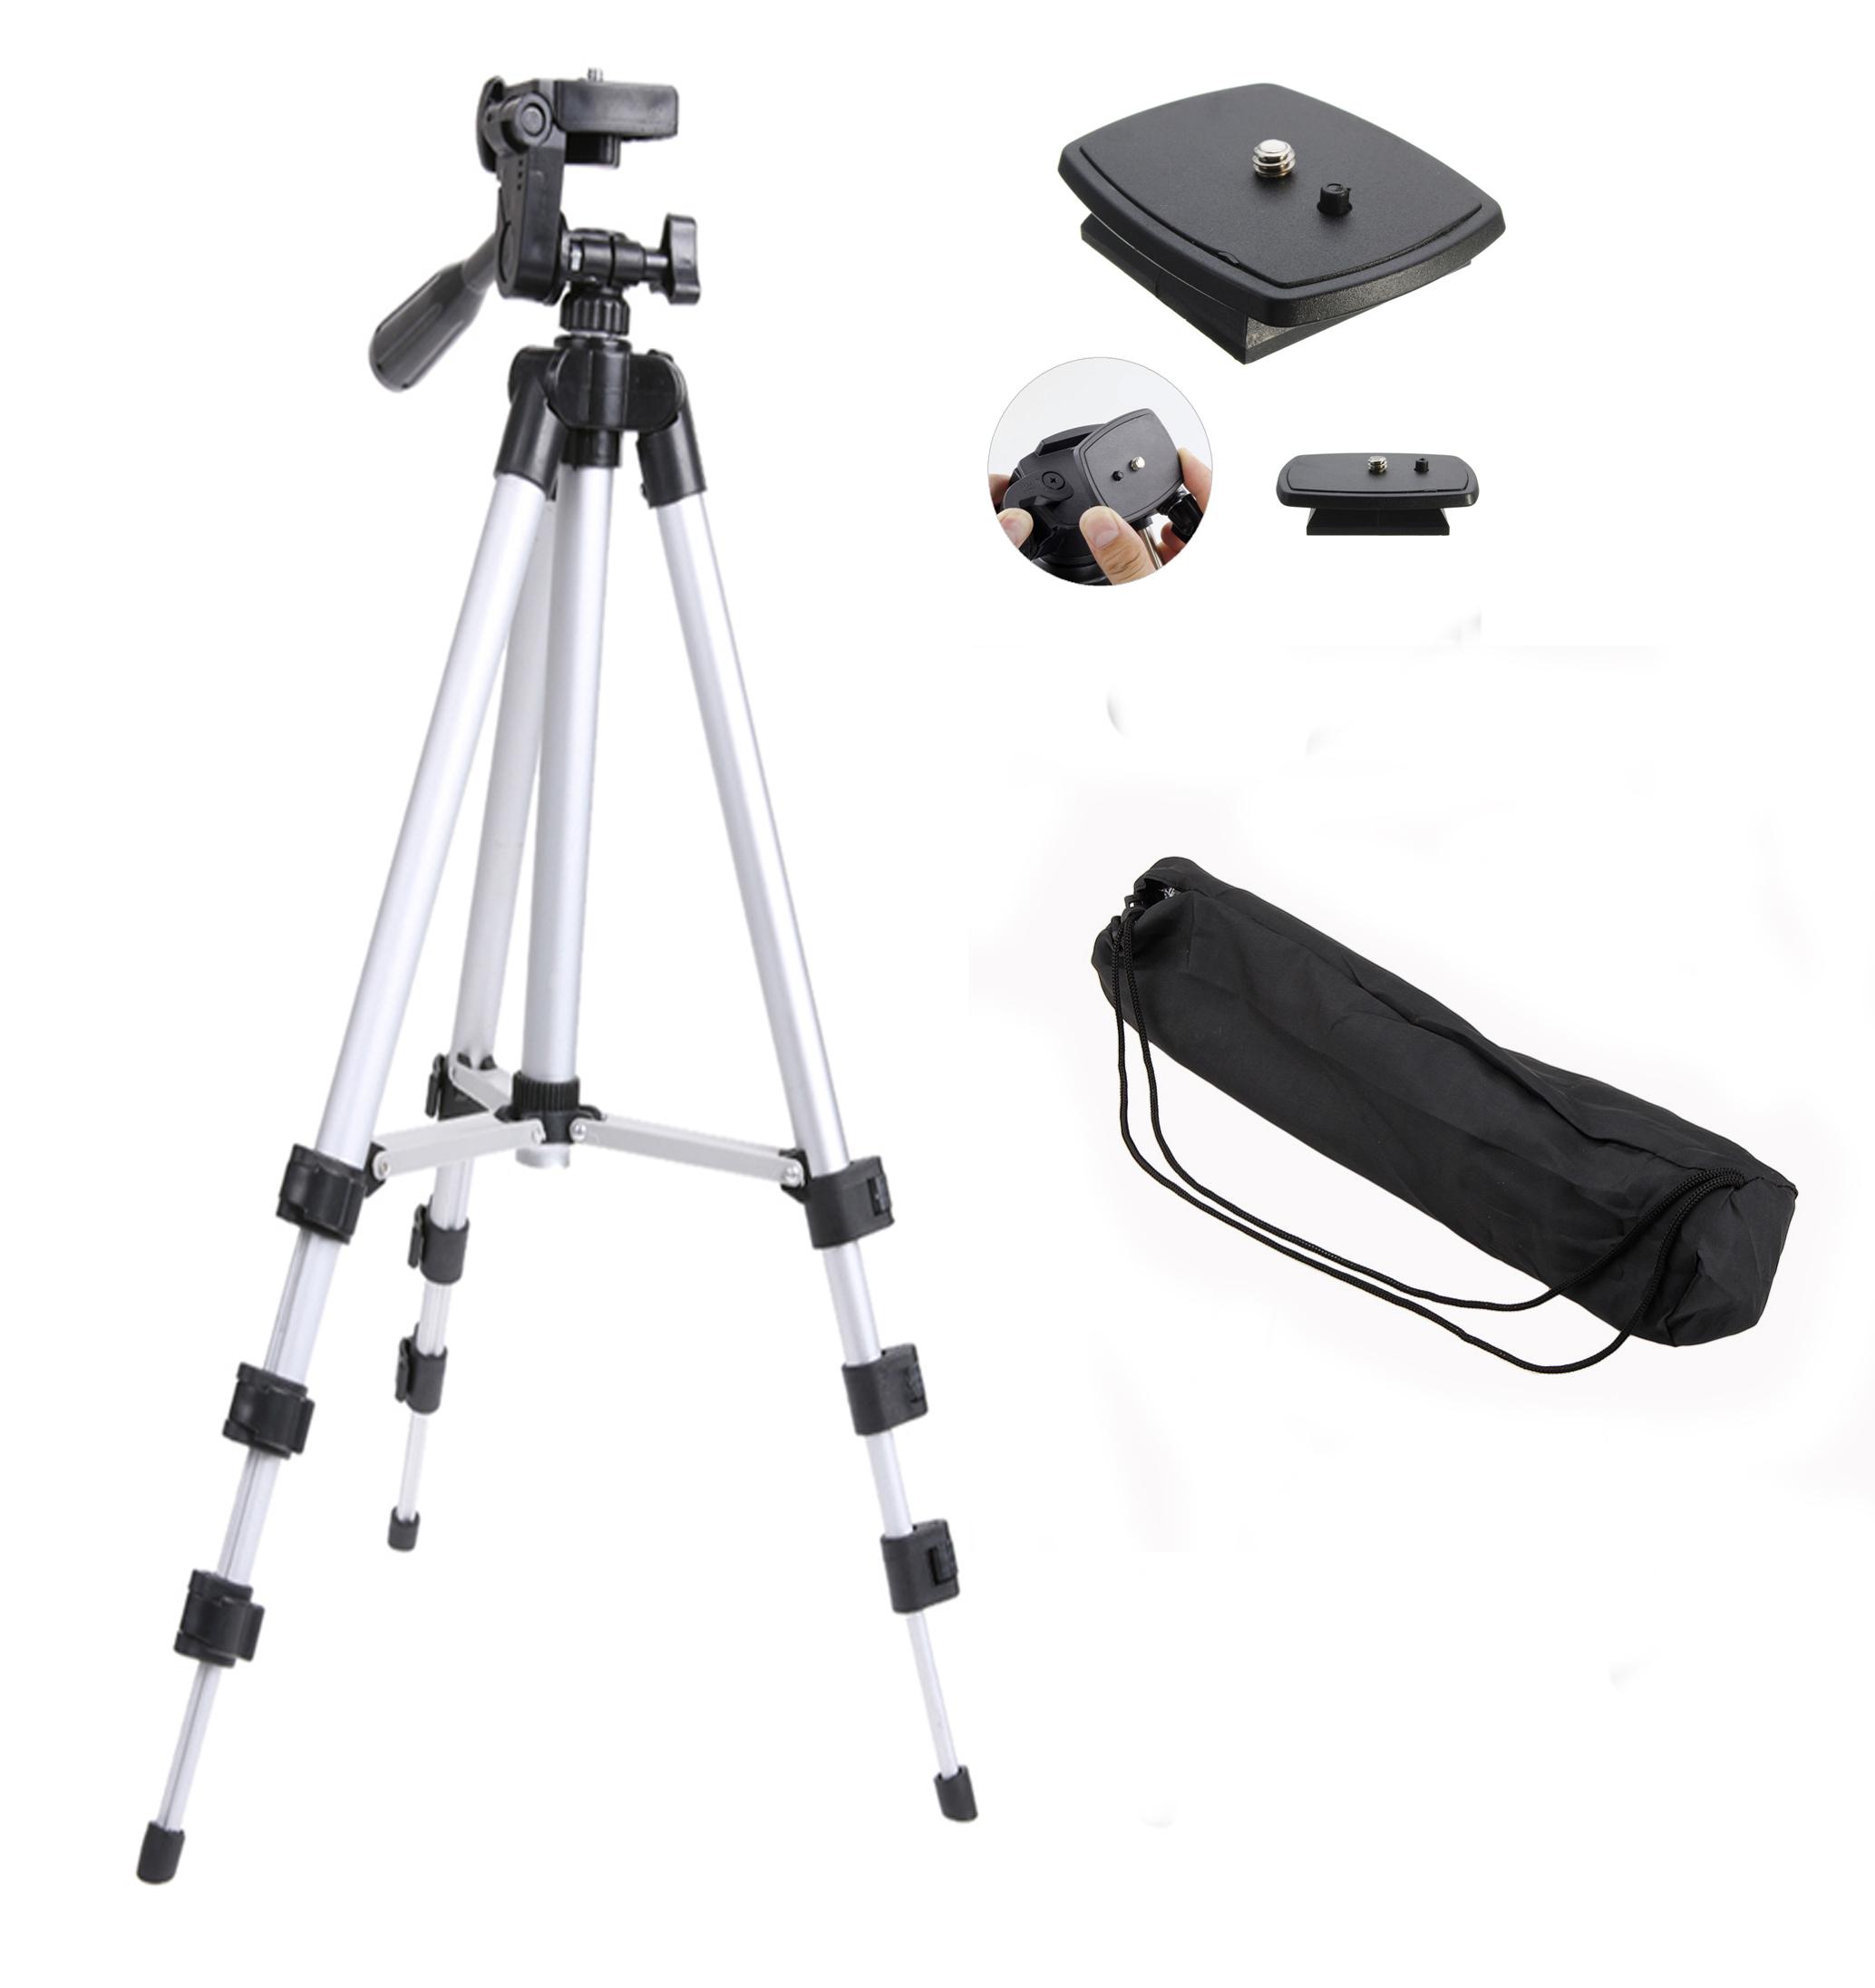 Statív pre Nikon COOLPIX P100 P500 P510 P520 P530